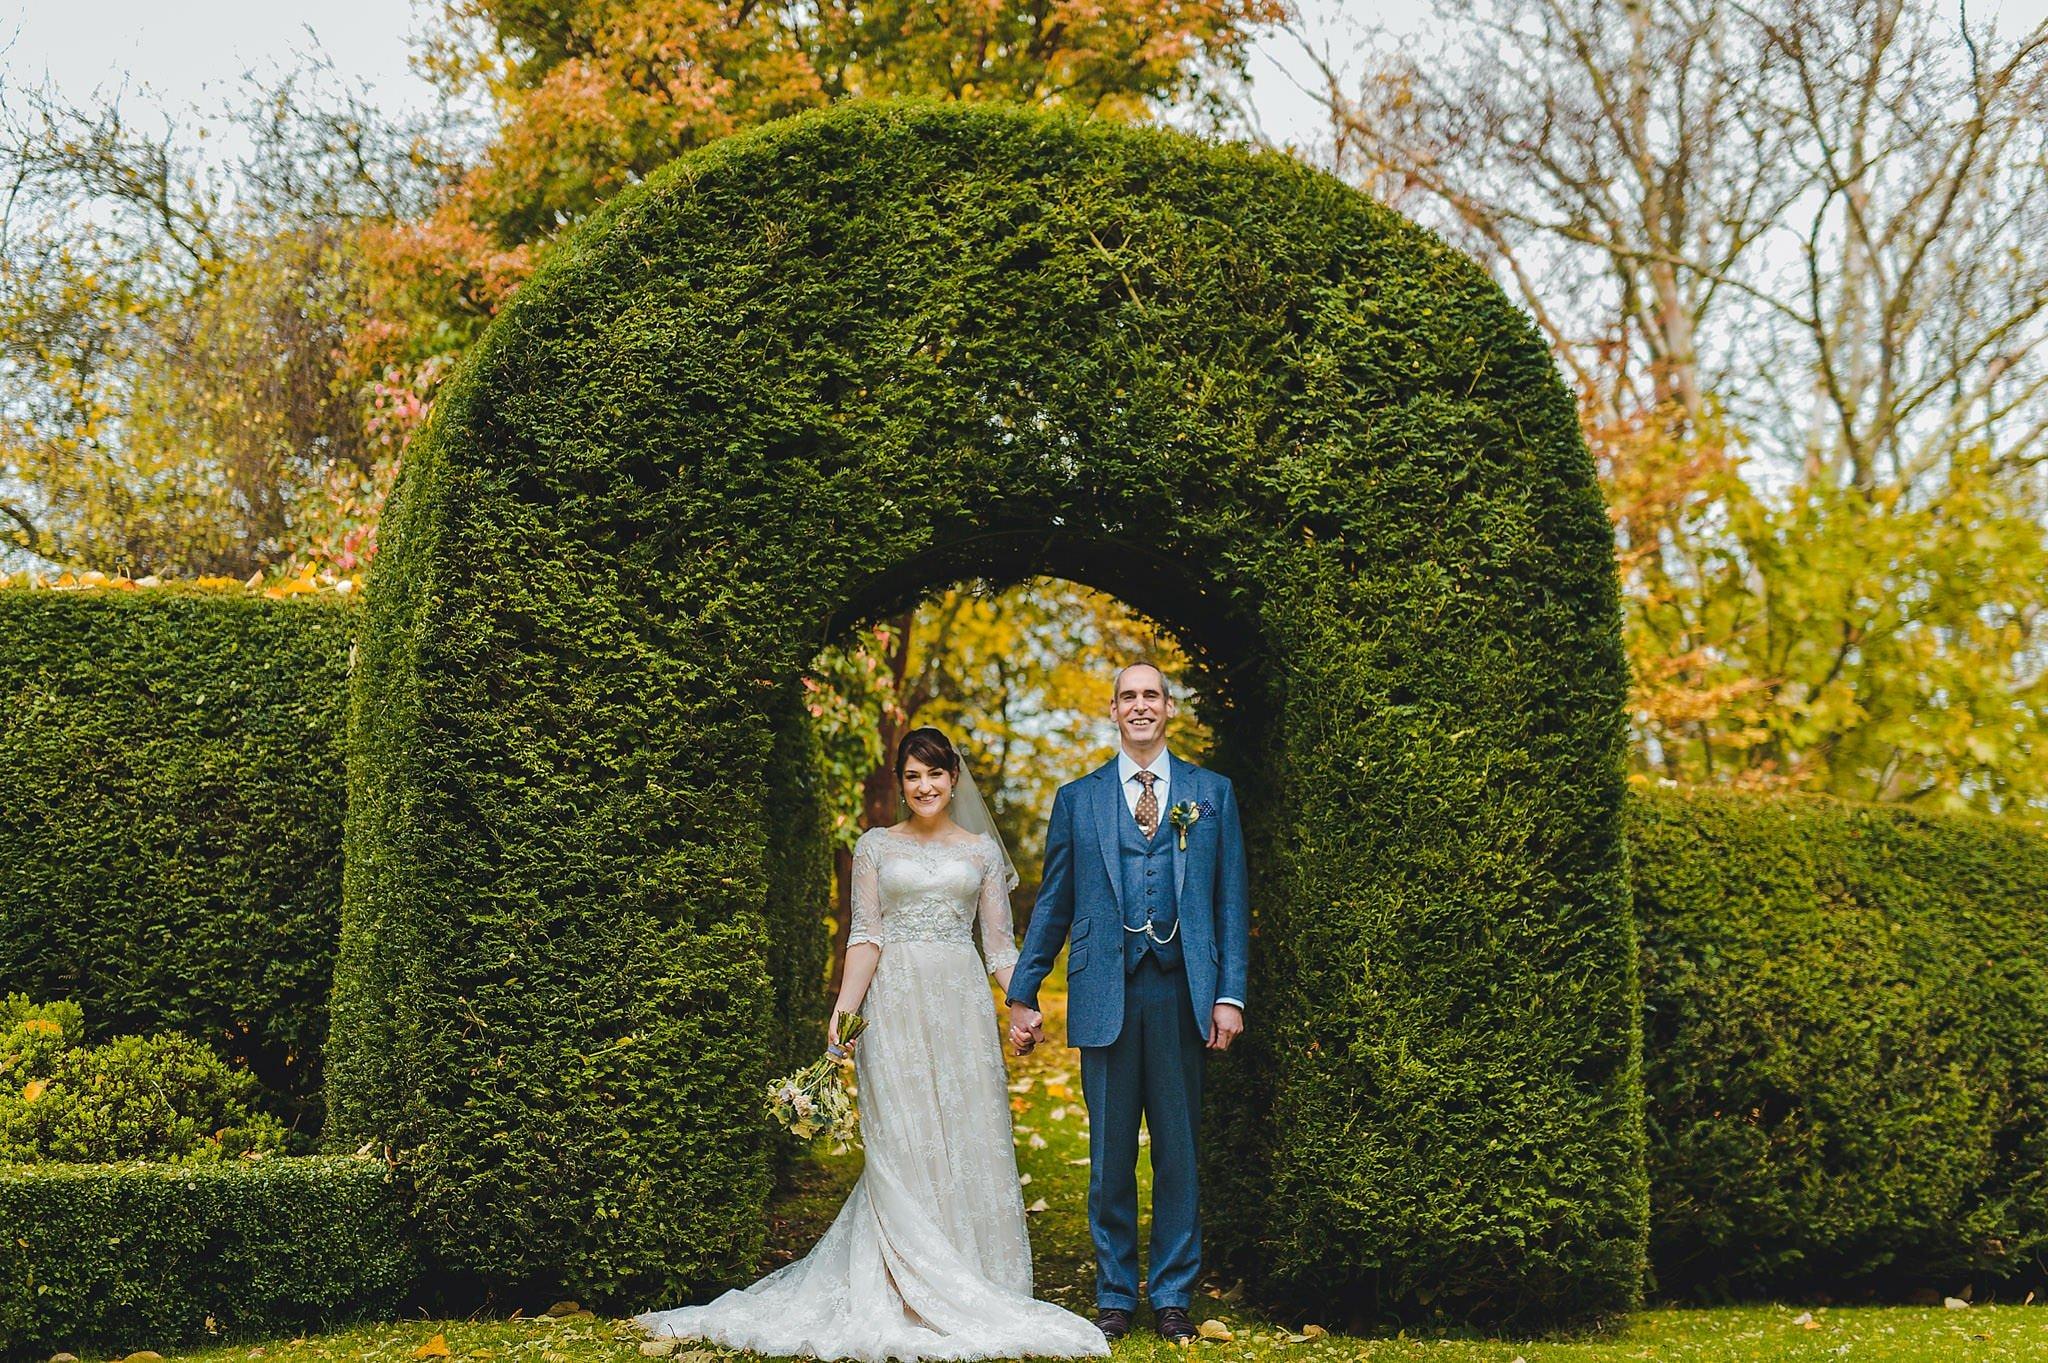 Dewsall Court wedding photography Herefordshire | Laura + Alex 84